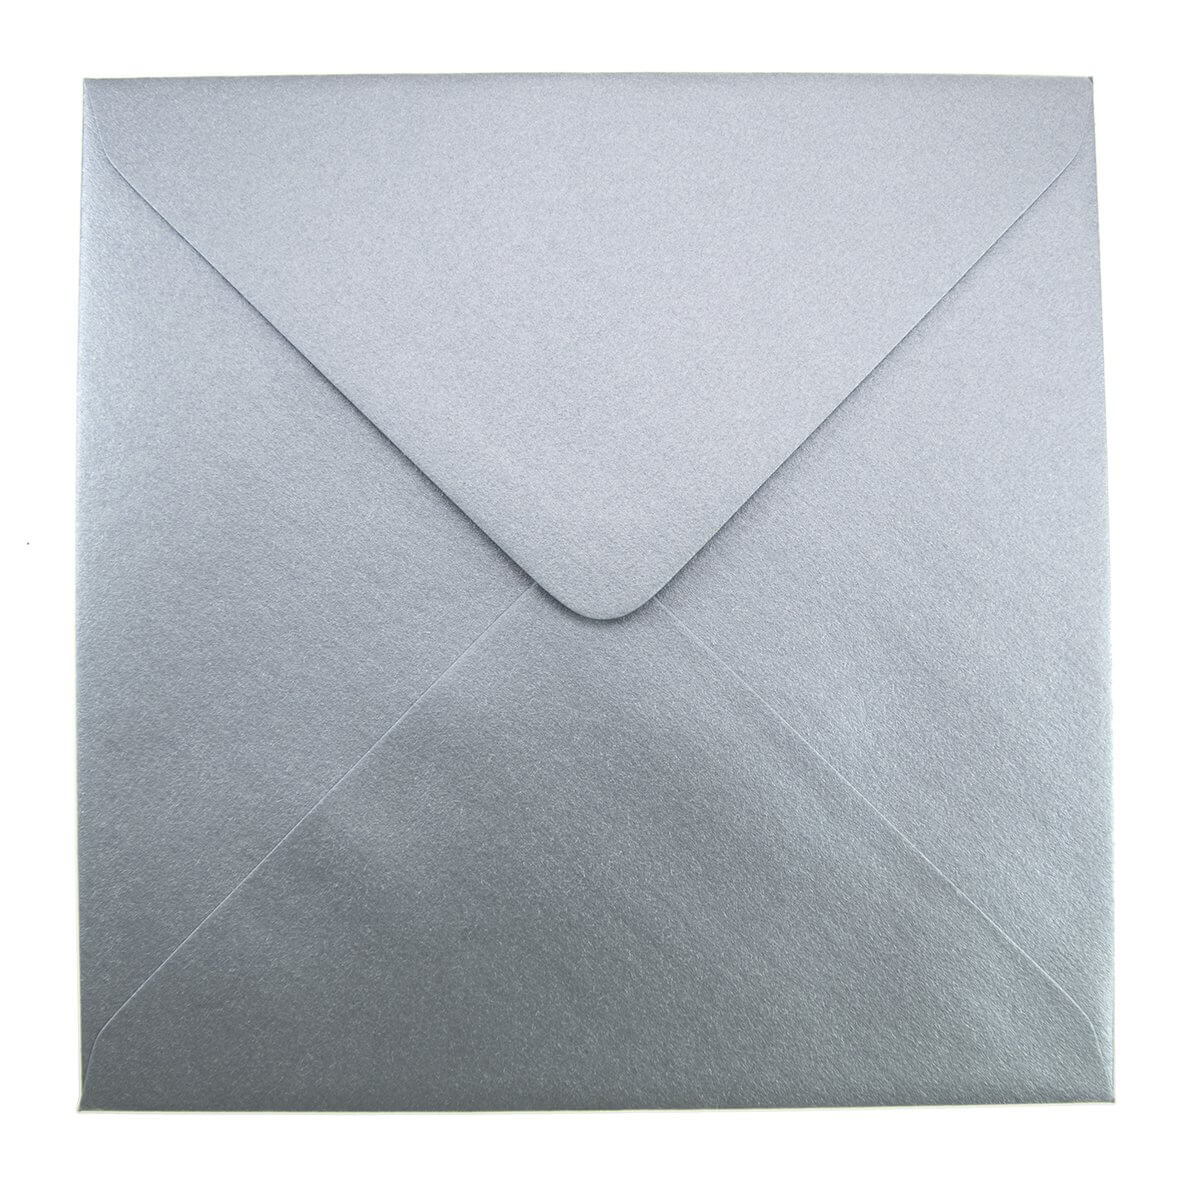 Soft Sheen Silver Large Square 155mm Envelope